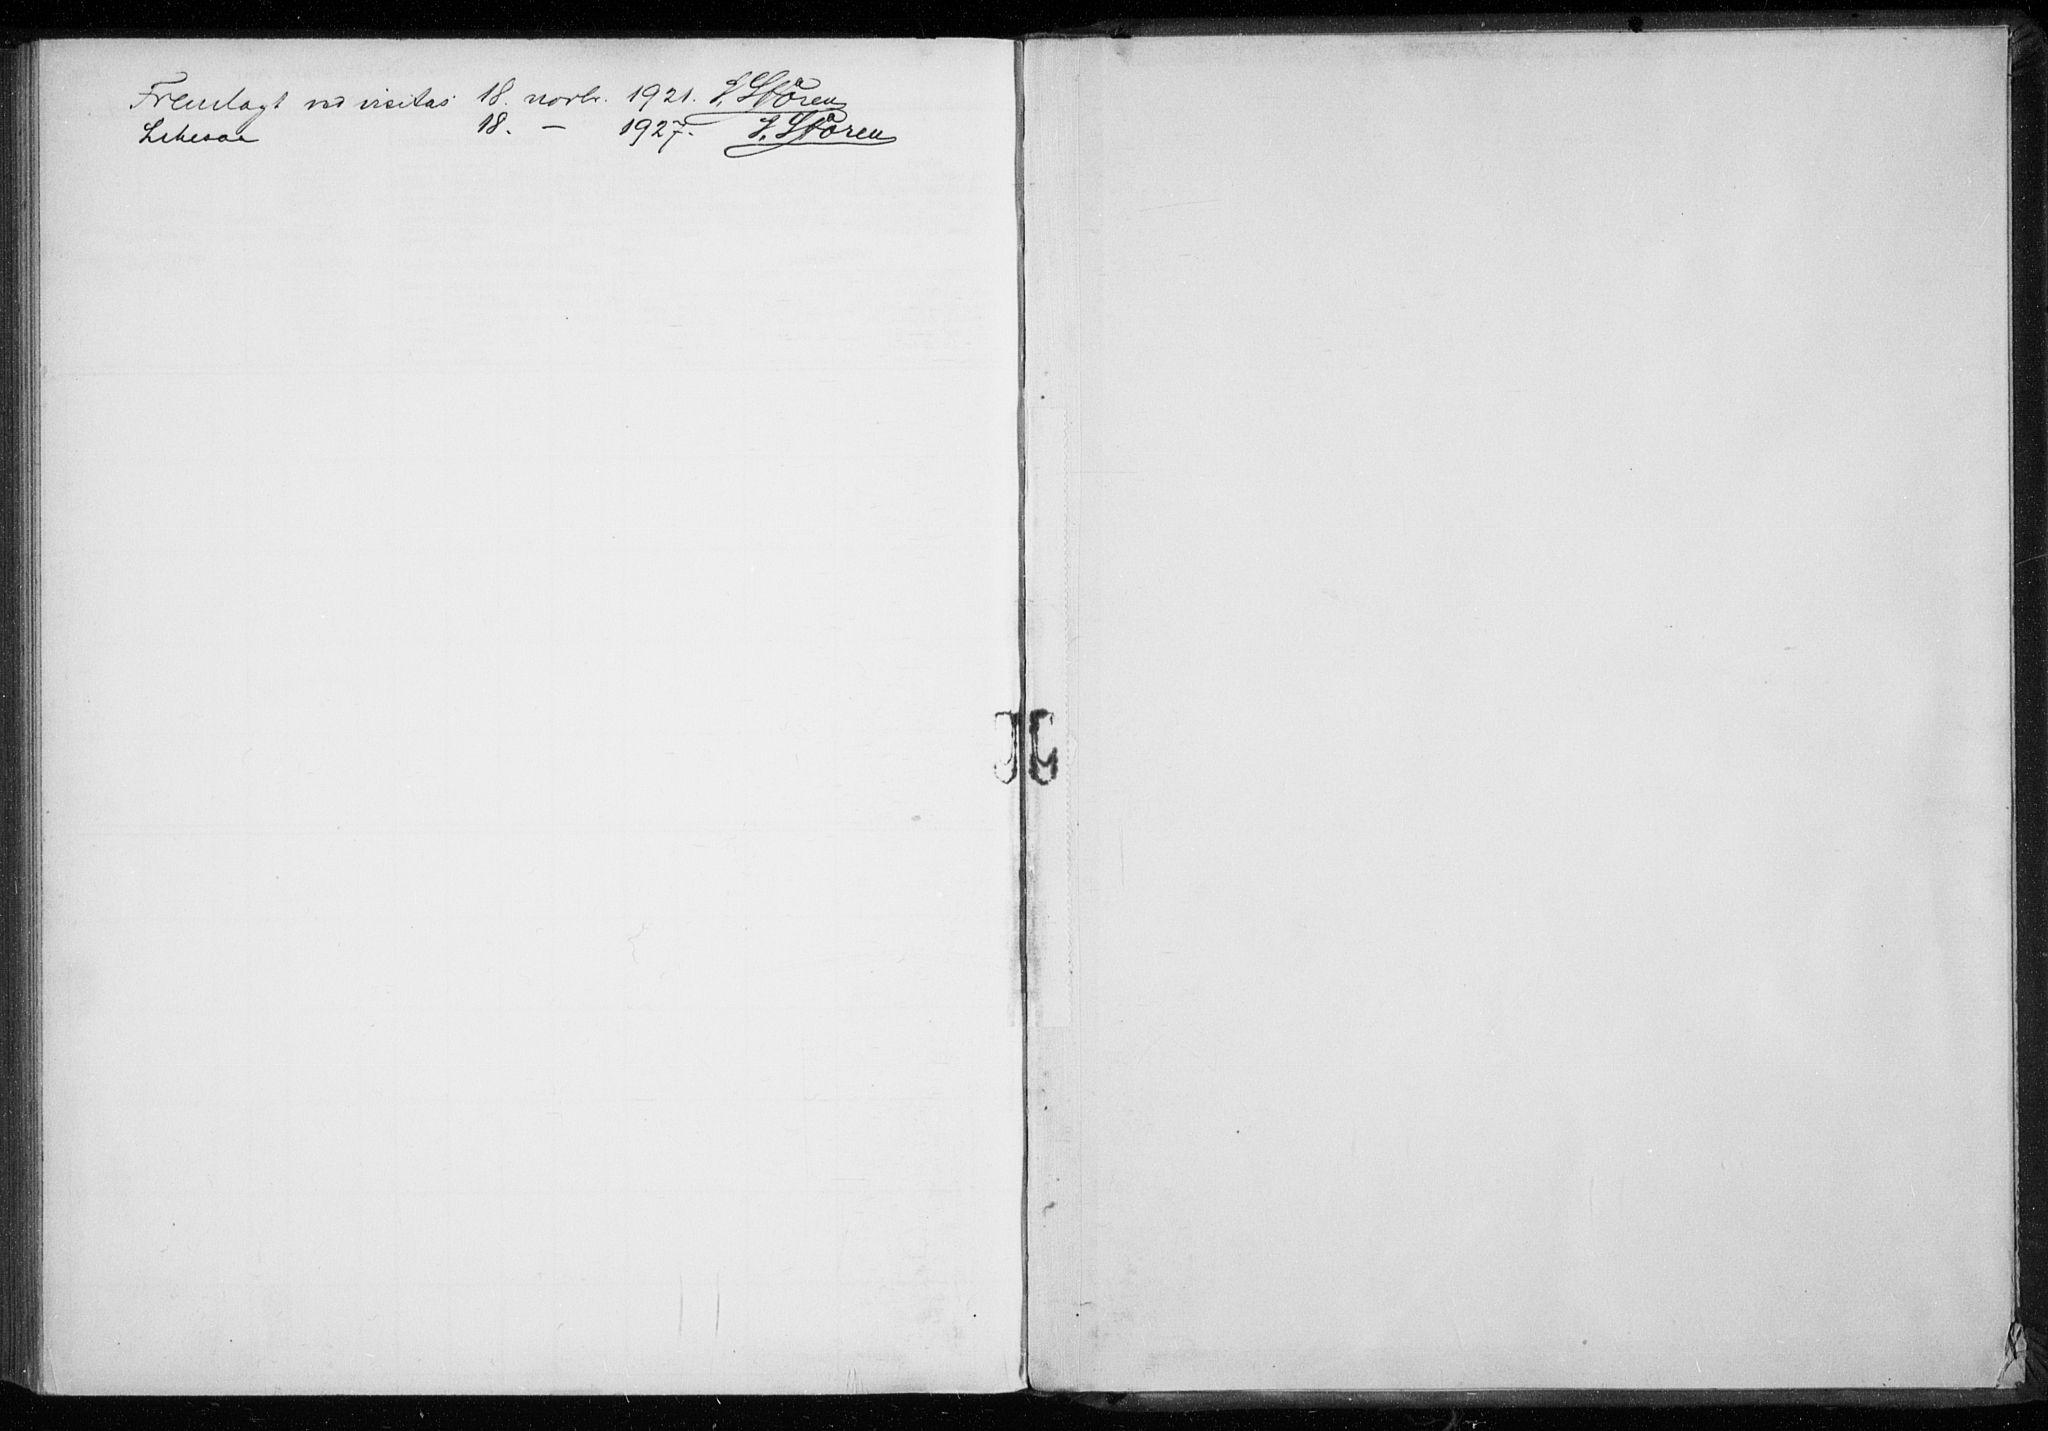 SATØ, Tromsø sokneprestkontor/stiftsprosti/domprosti, H/Ha/L0132: Fødselsregister nr. 132, 1921-1927